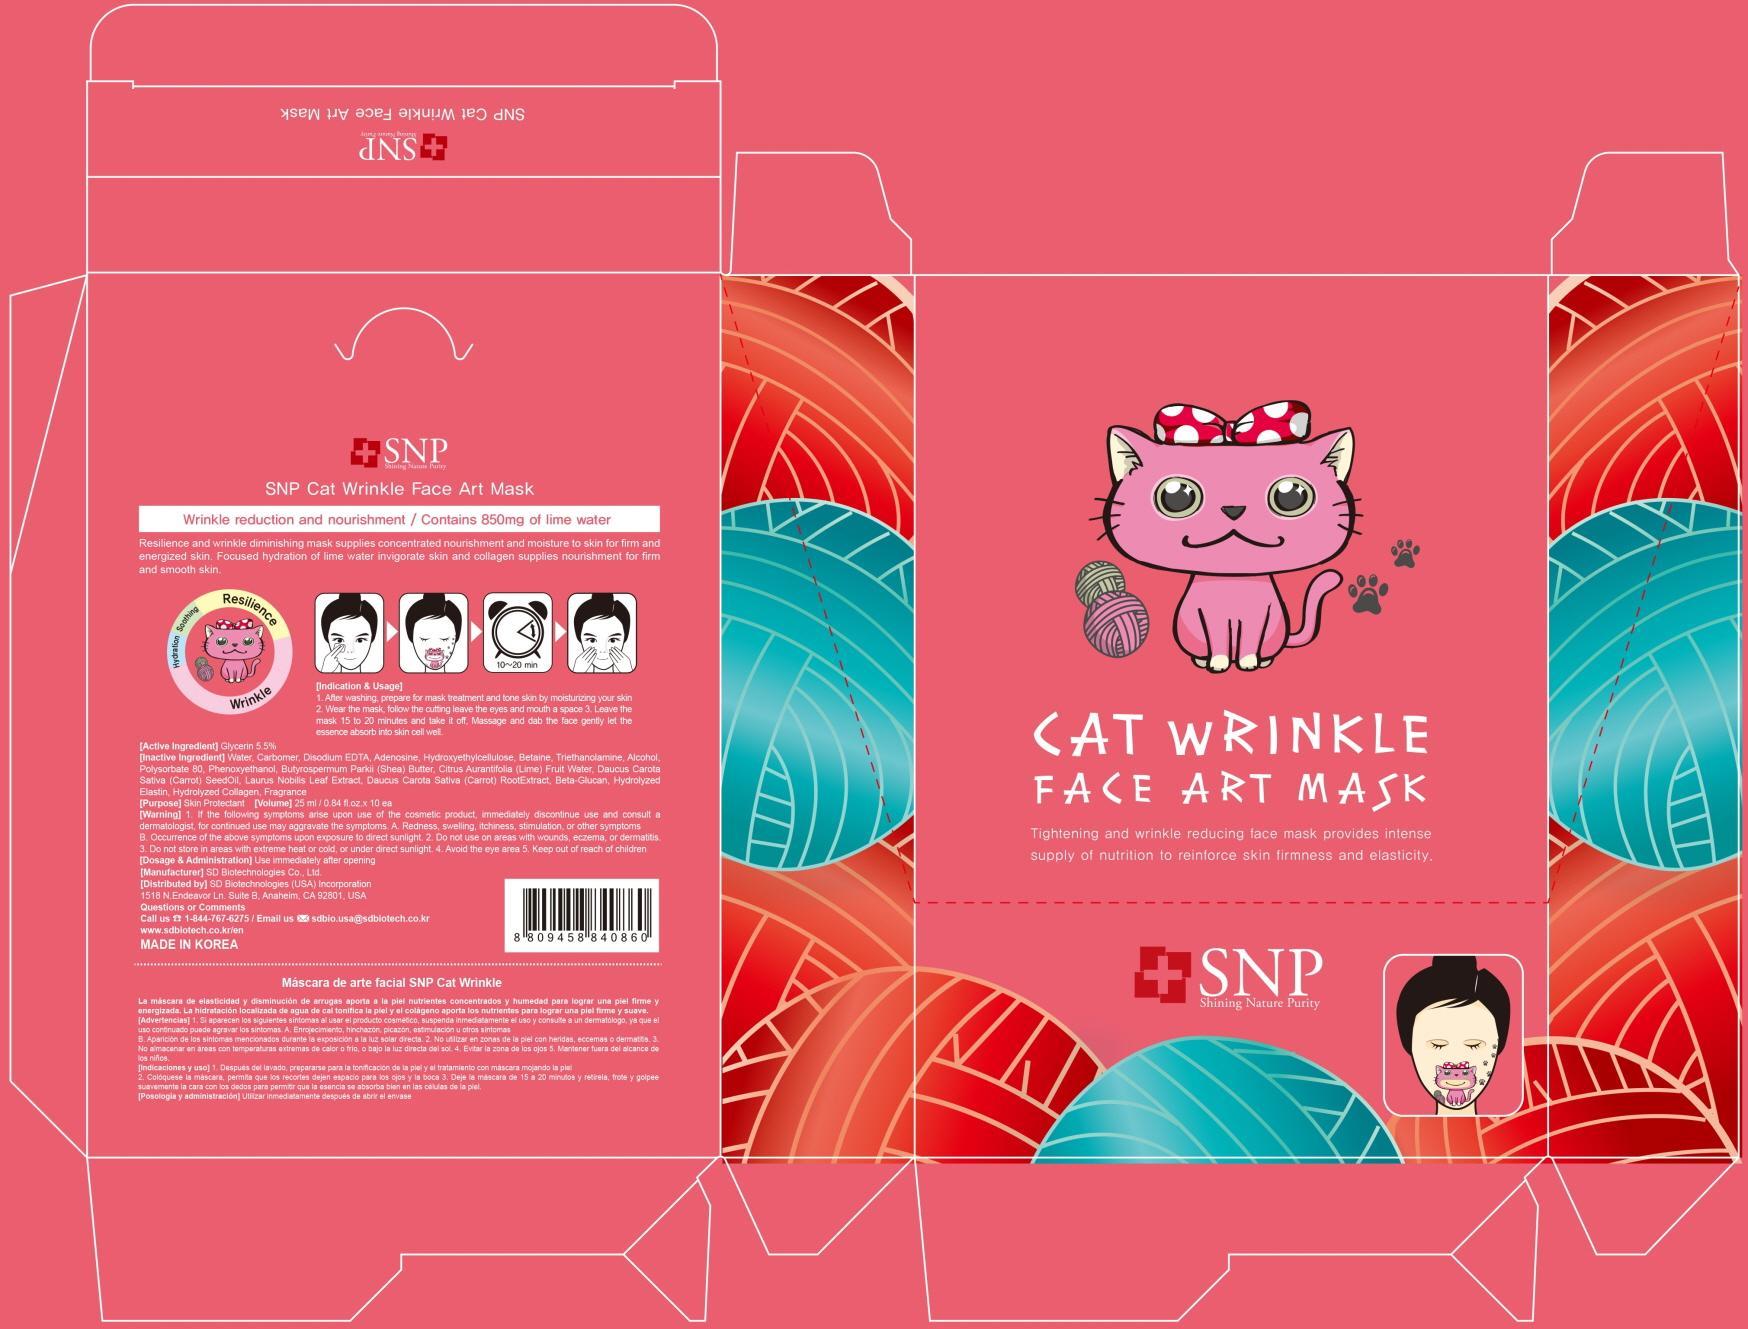 Snp Cat Wrinkle Face Art Mask | Glycerin Patch Breastfeeding